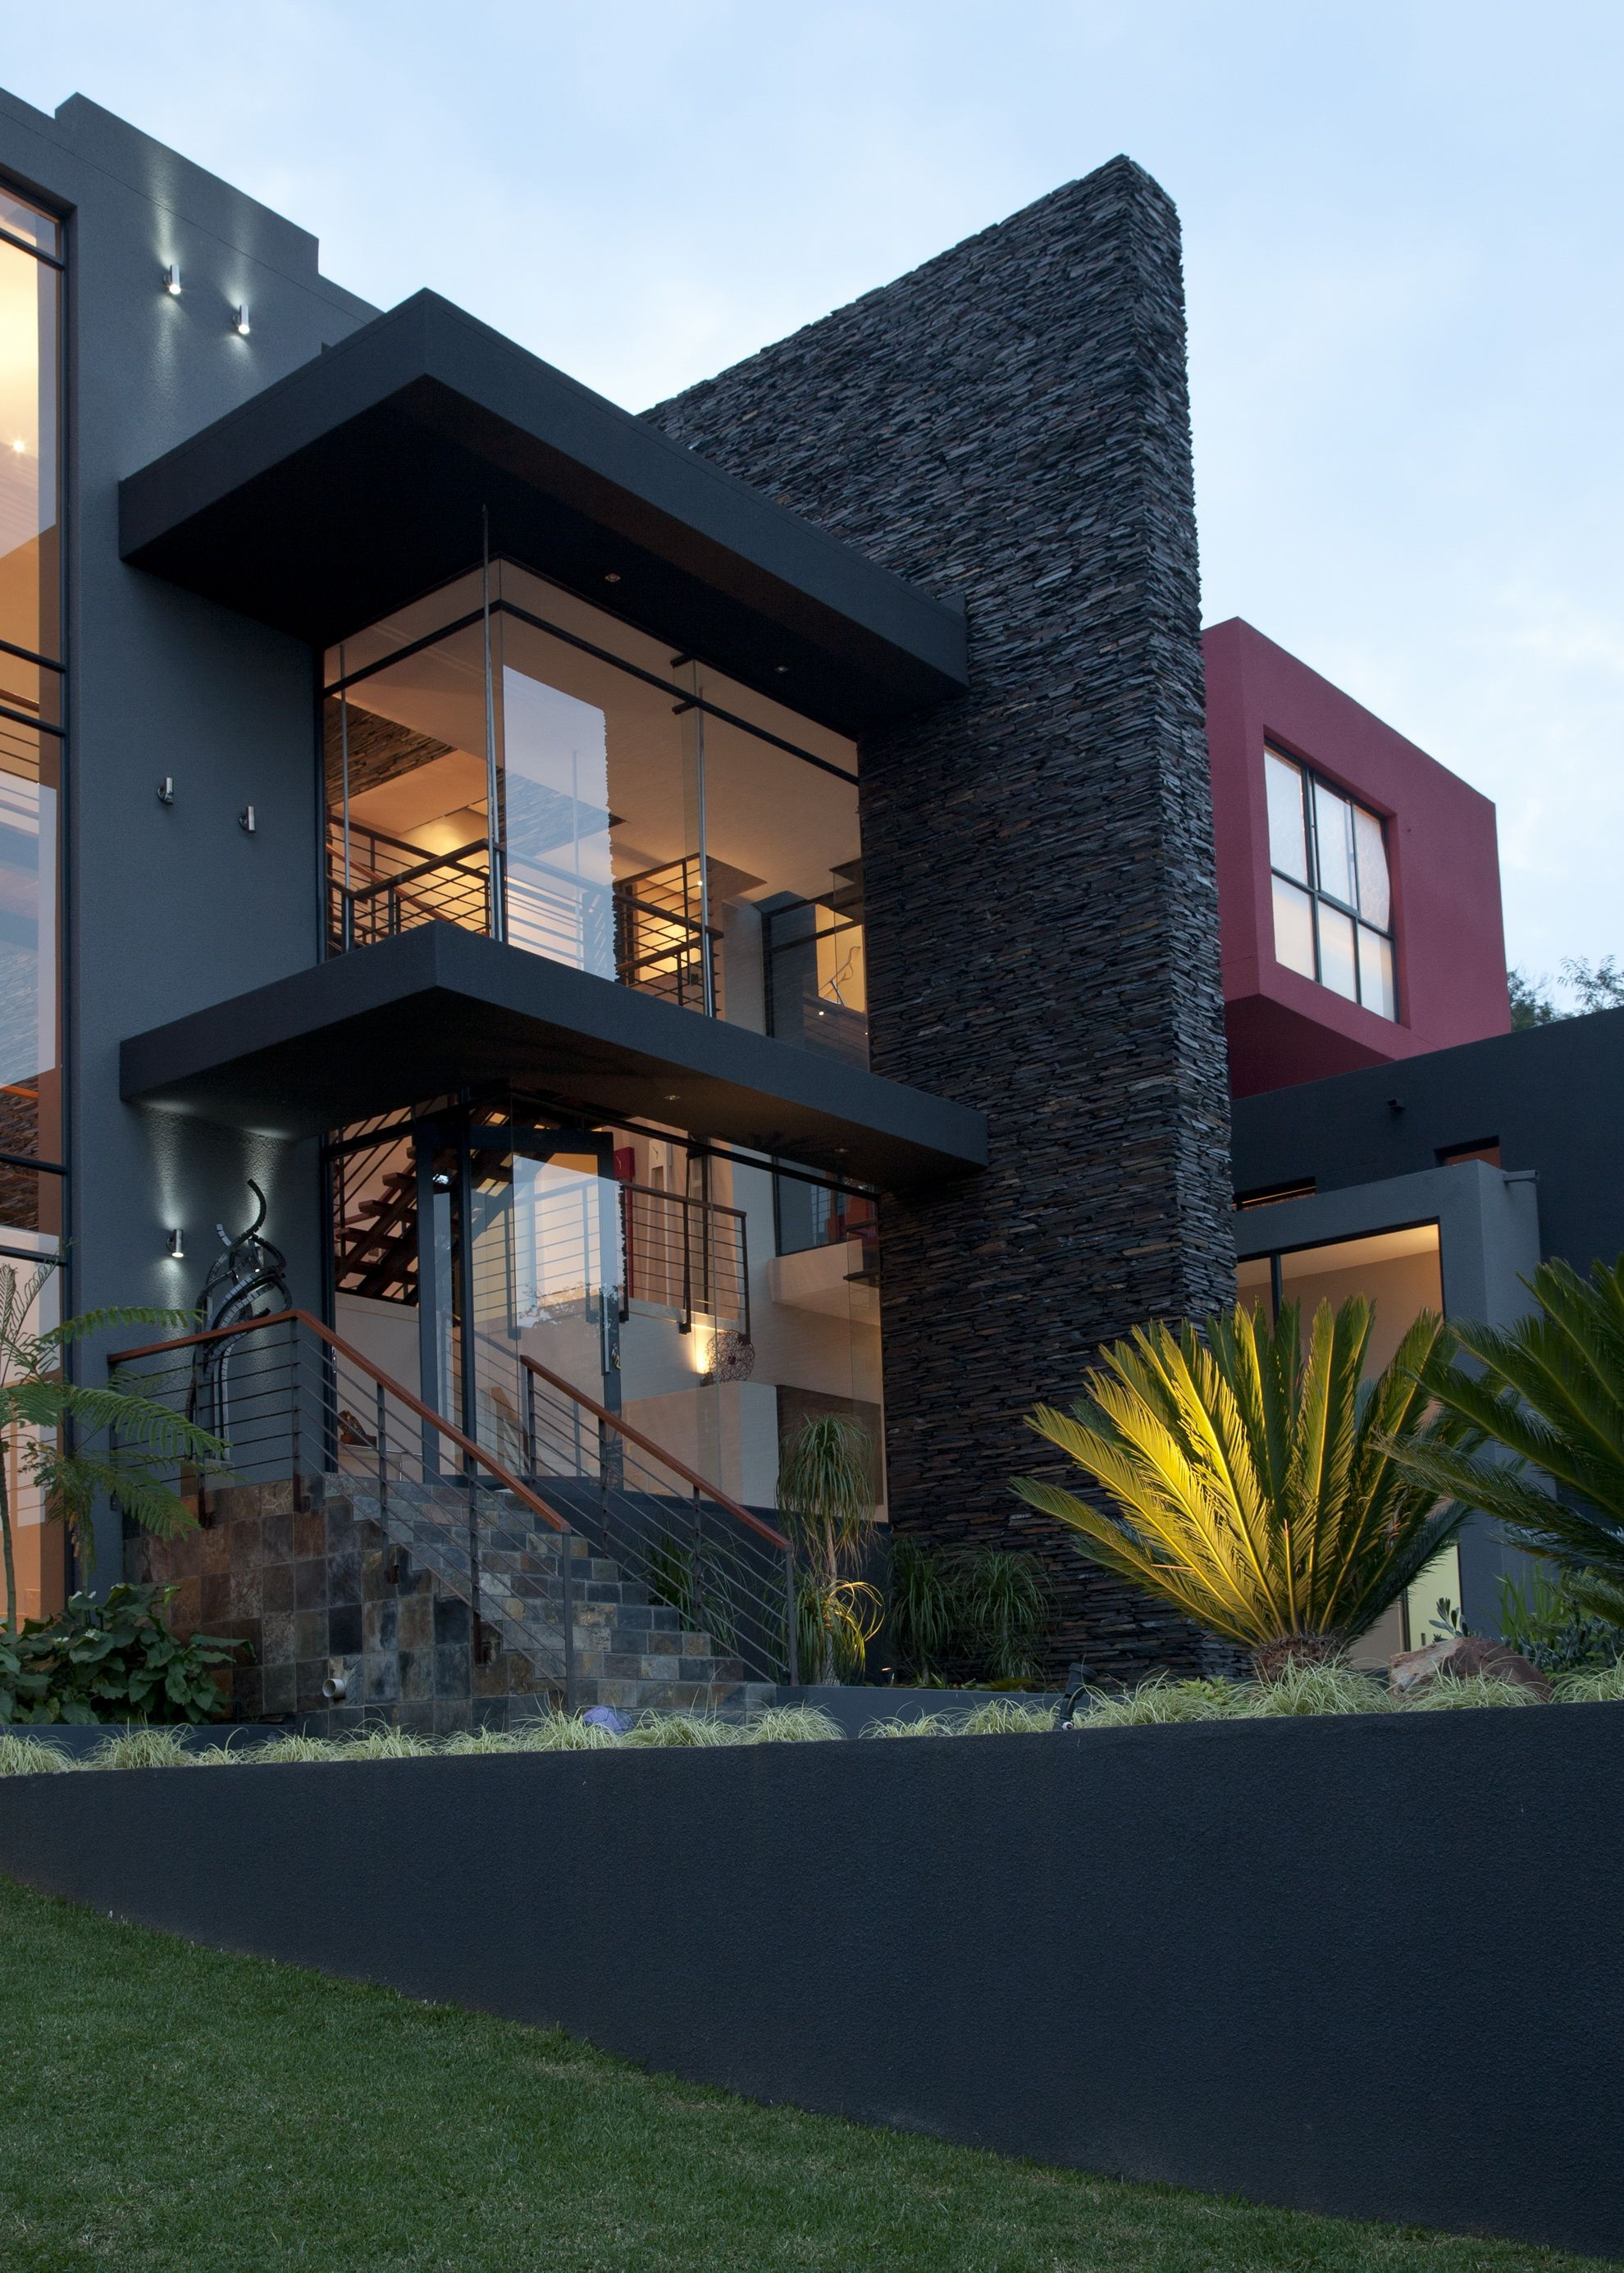 49 Most Popular Modern Dream House Exterior Design Ideas 3 In 2020: Modern Architecture, Modern House Design, Architecture